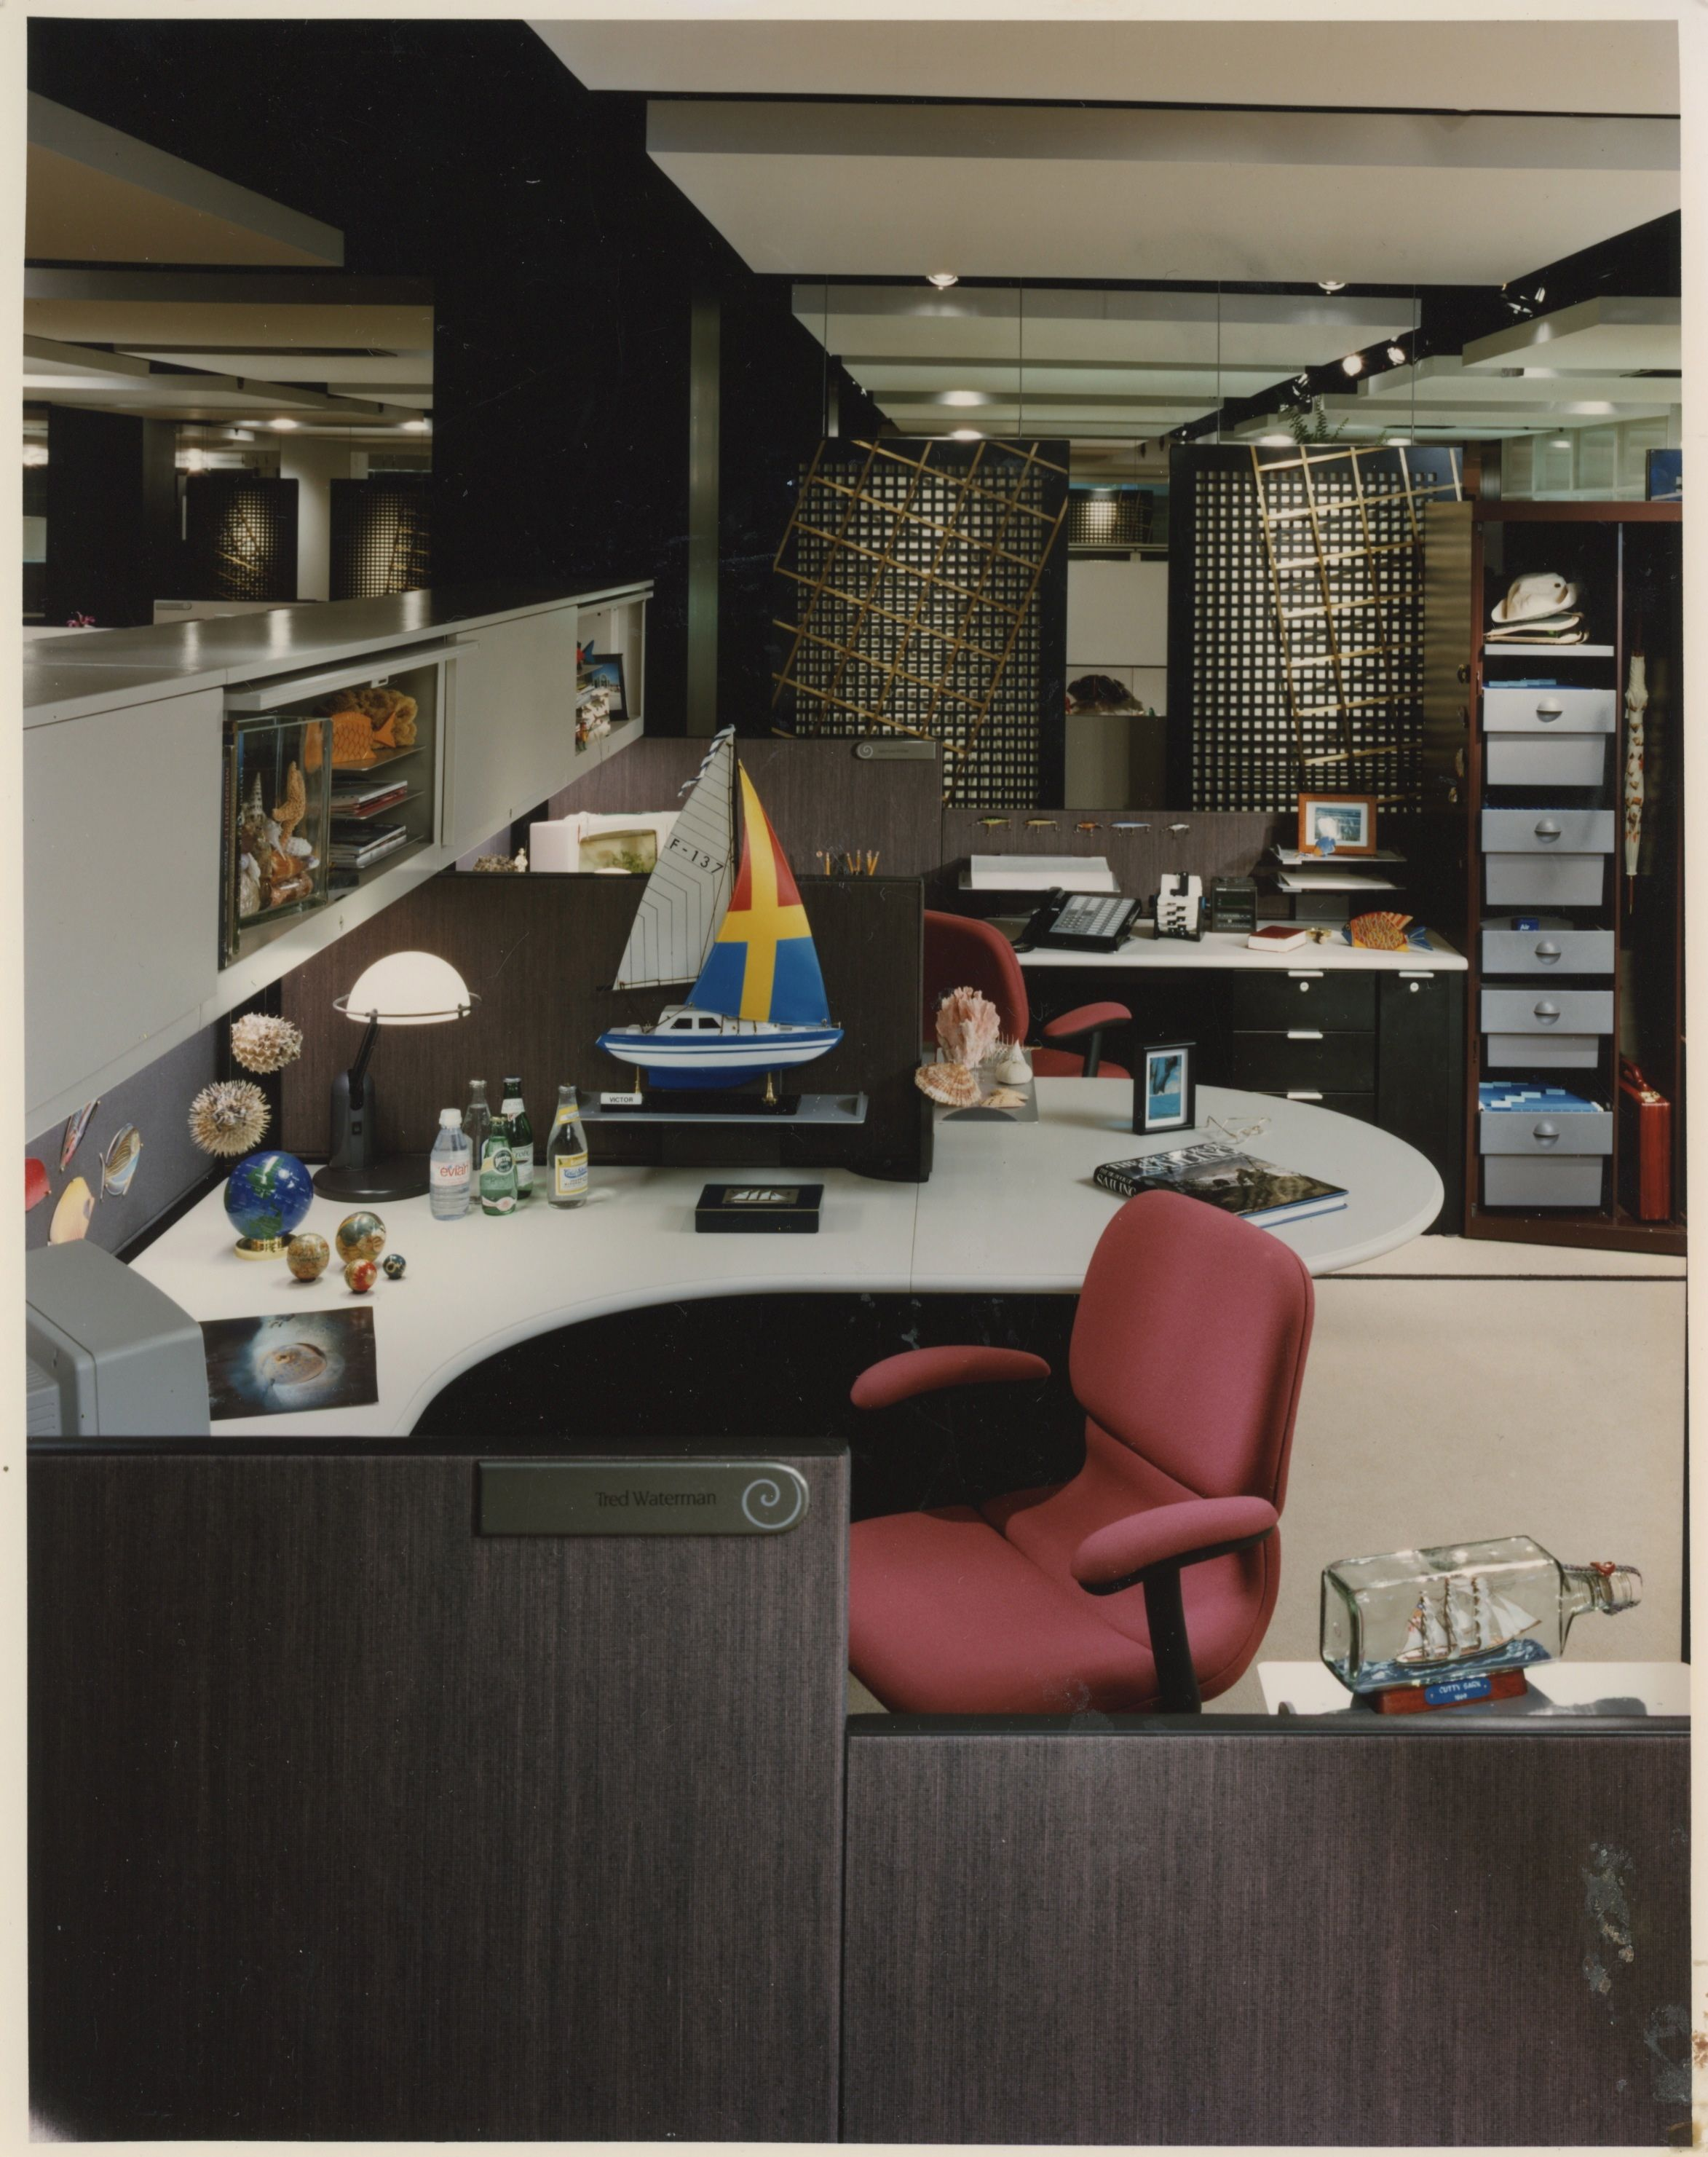 Steelcase showroom photo. Early 1990s. | Home decor, Room ...